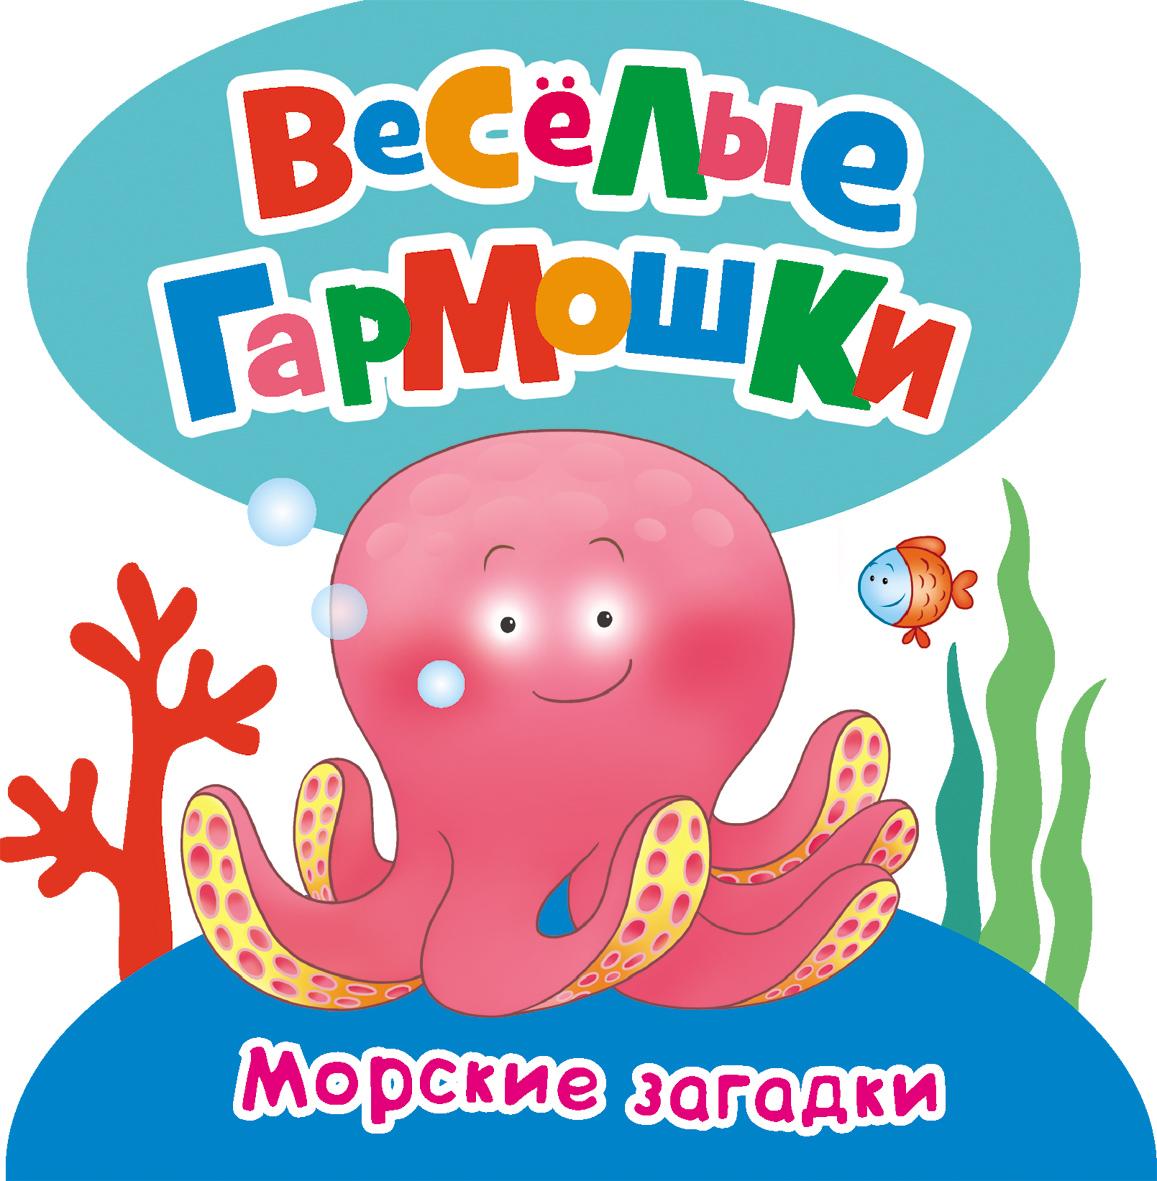 цены Михаил Грозовский,Марина Дружинина,Наталия Волкова Морские загадки